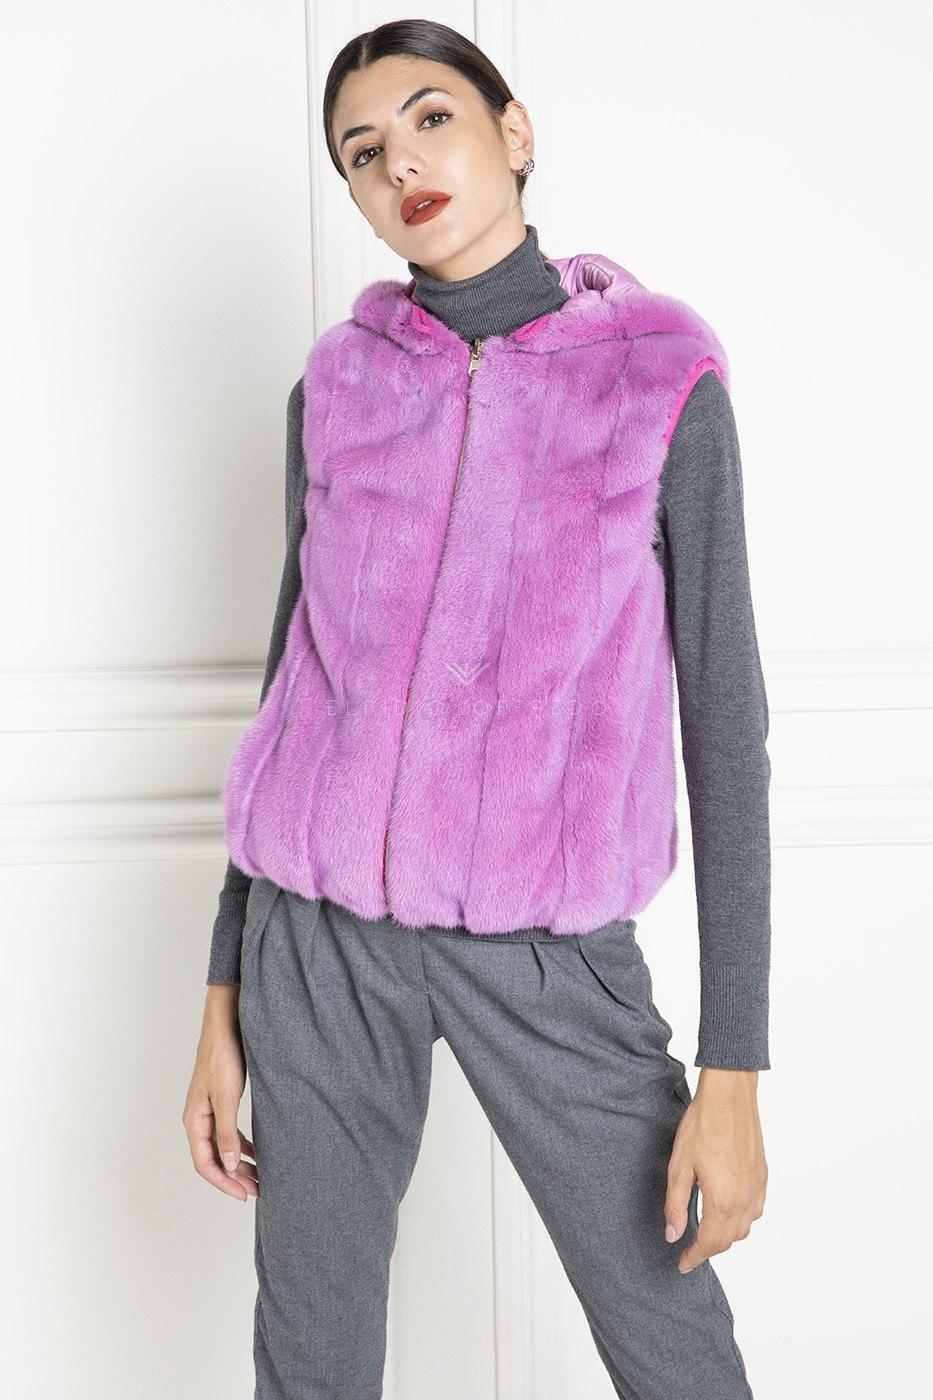 Pink Mink Fur Vest with Hoodie - Length 60 cm